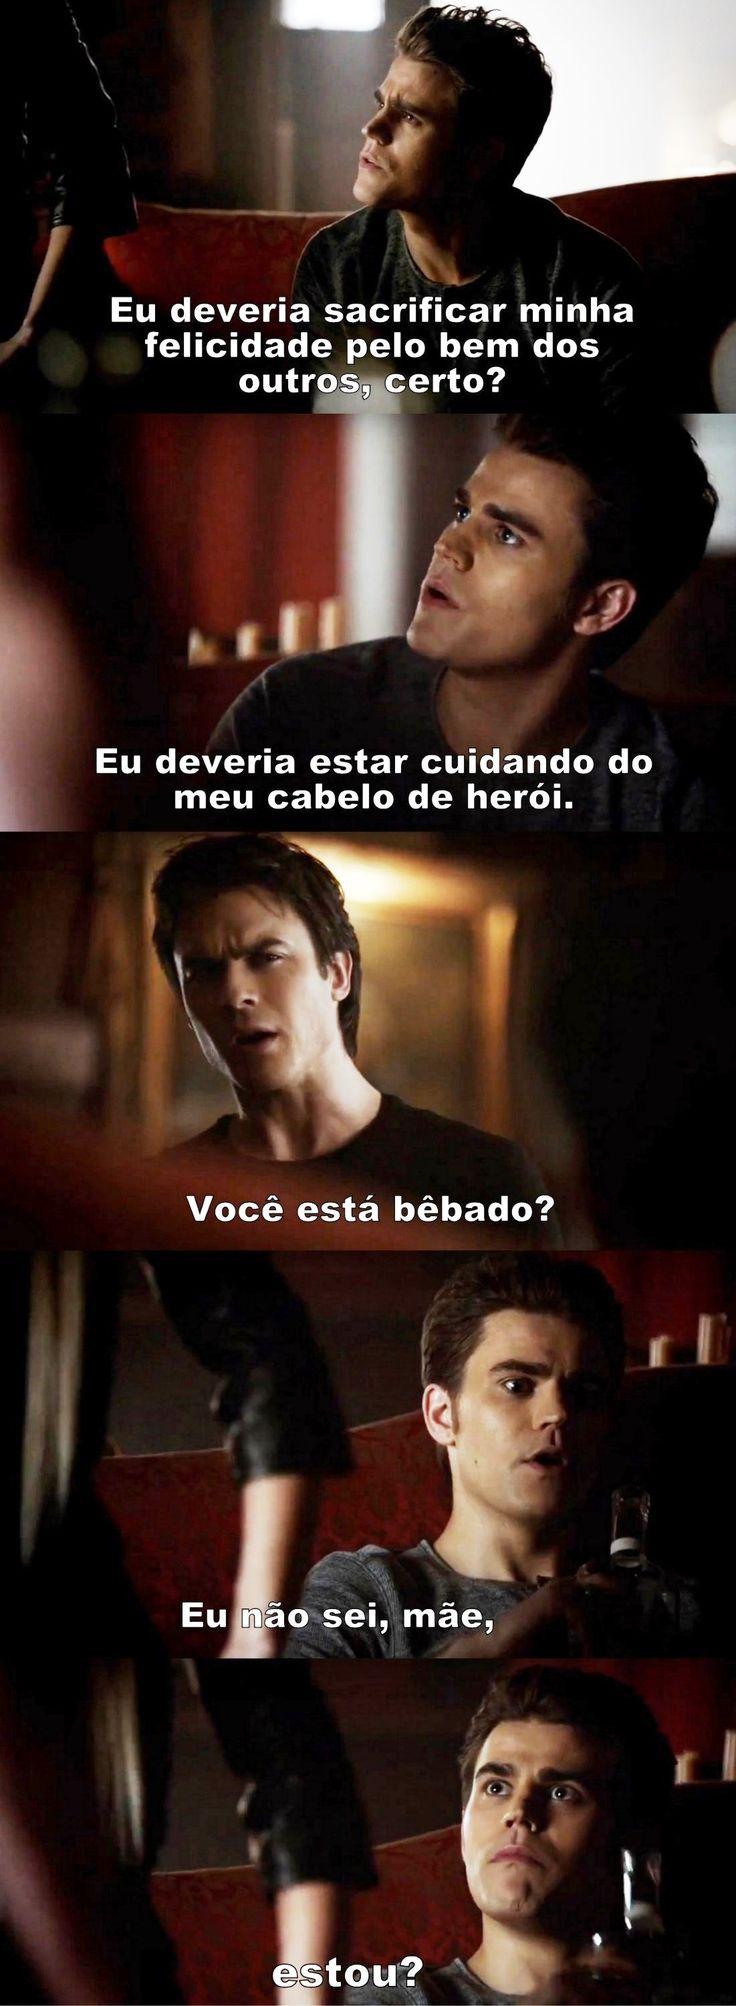 Diários de um vampiro 4x23 - Damon e Stefan